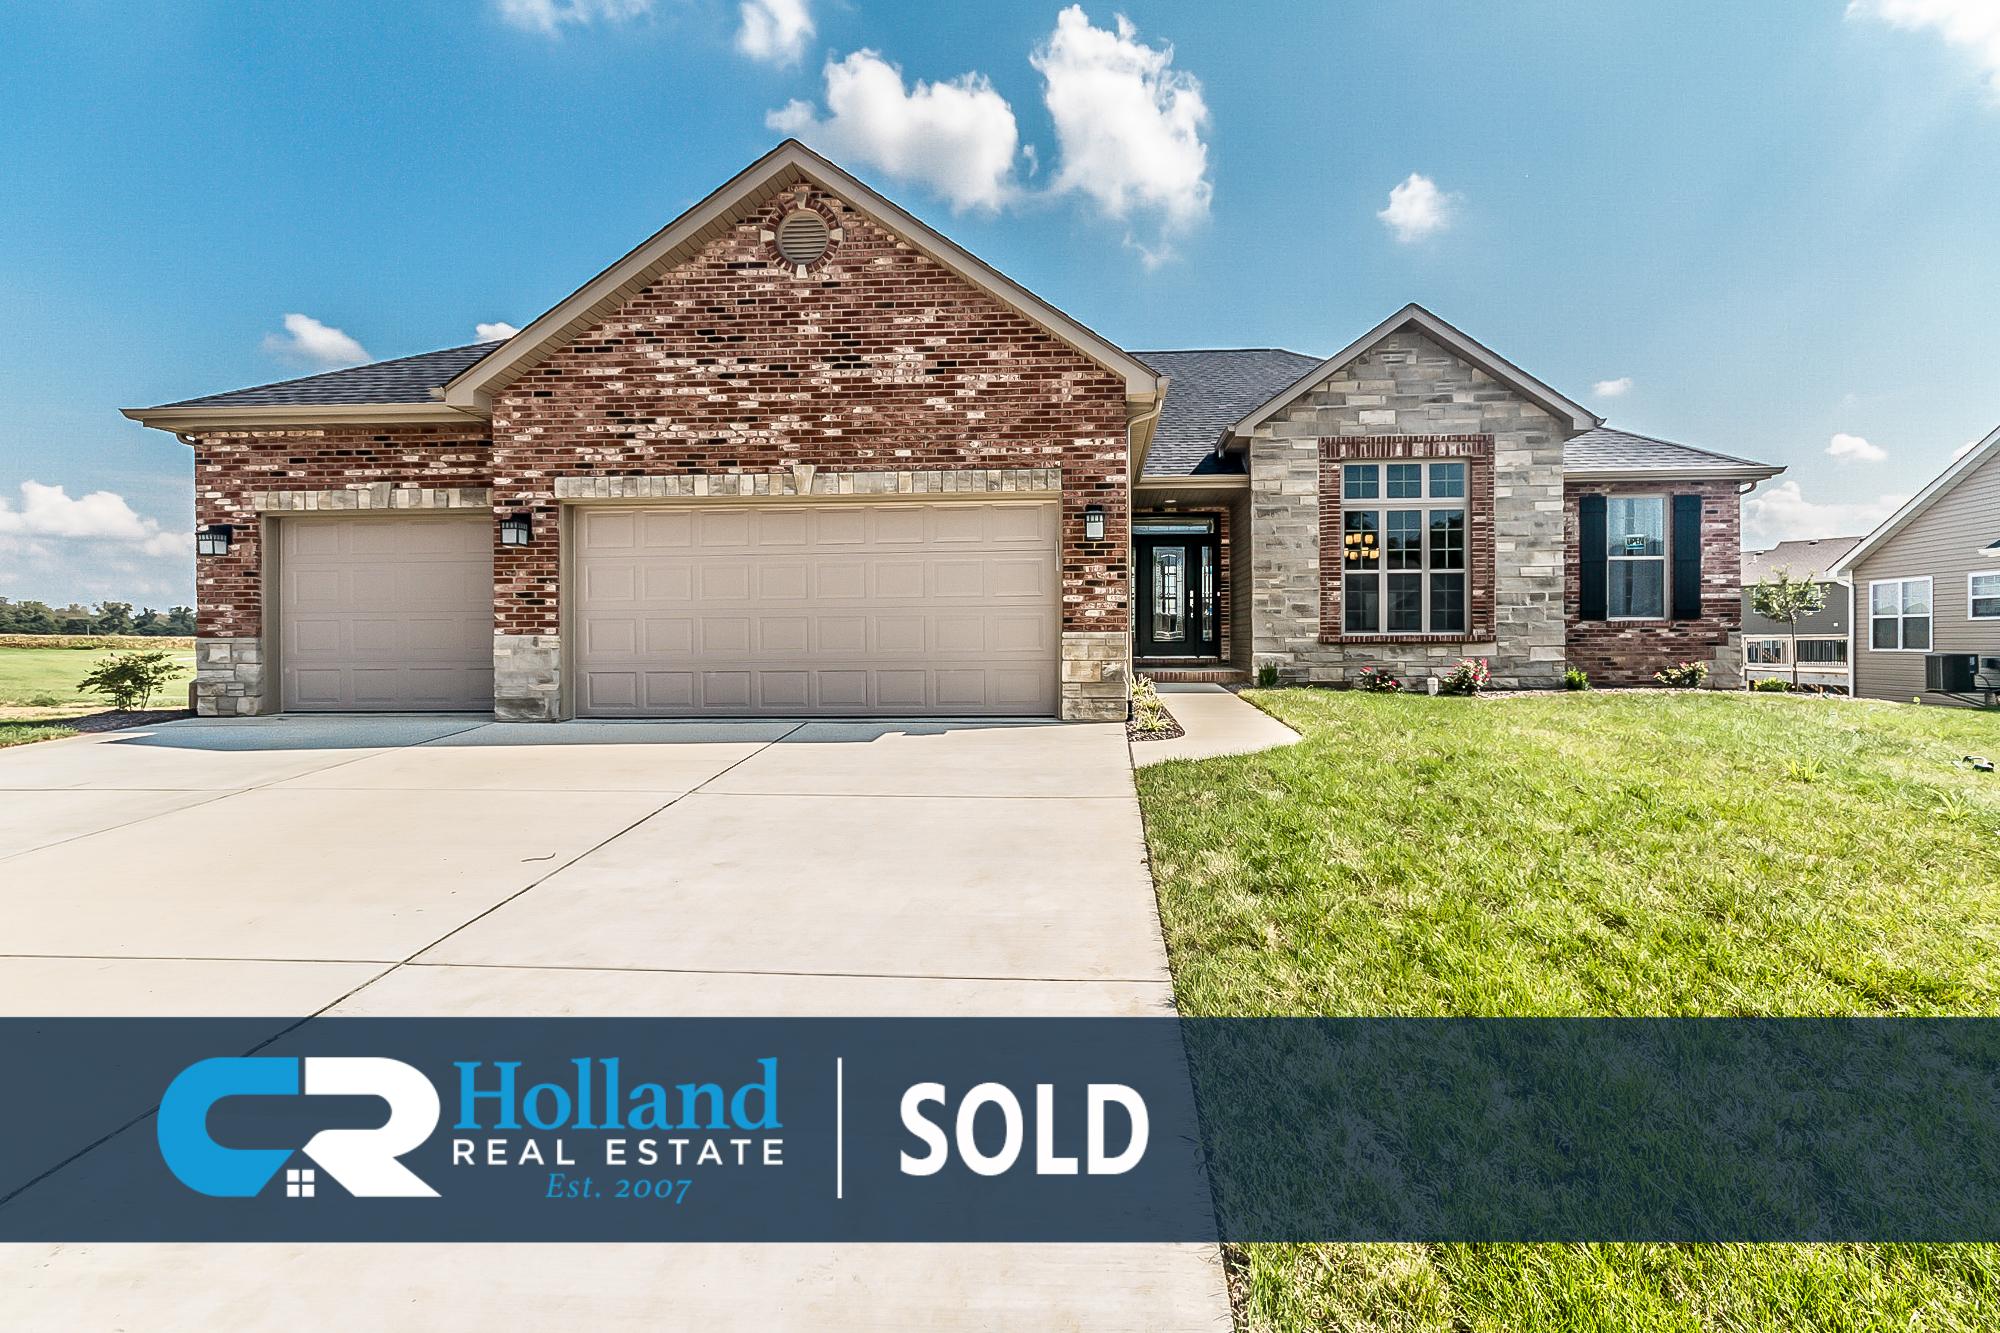 0-For-Sale-New-Construction-Ofallon-Illinois-CR-Holland-Sold-1.jpg